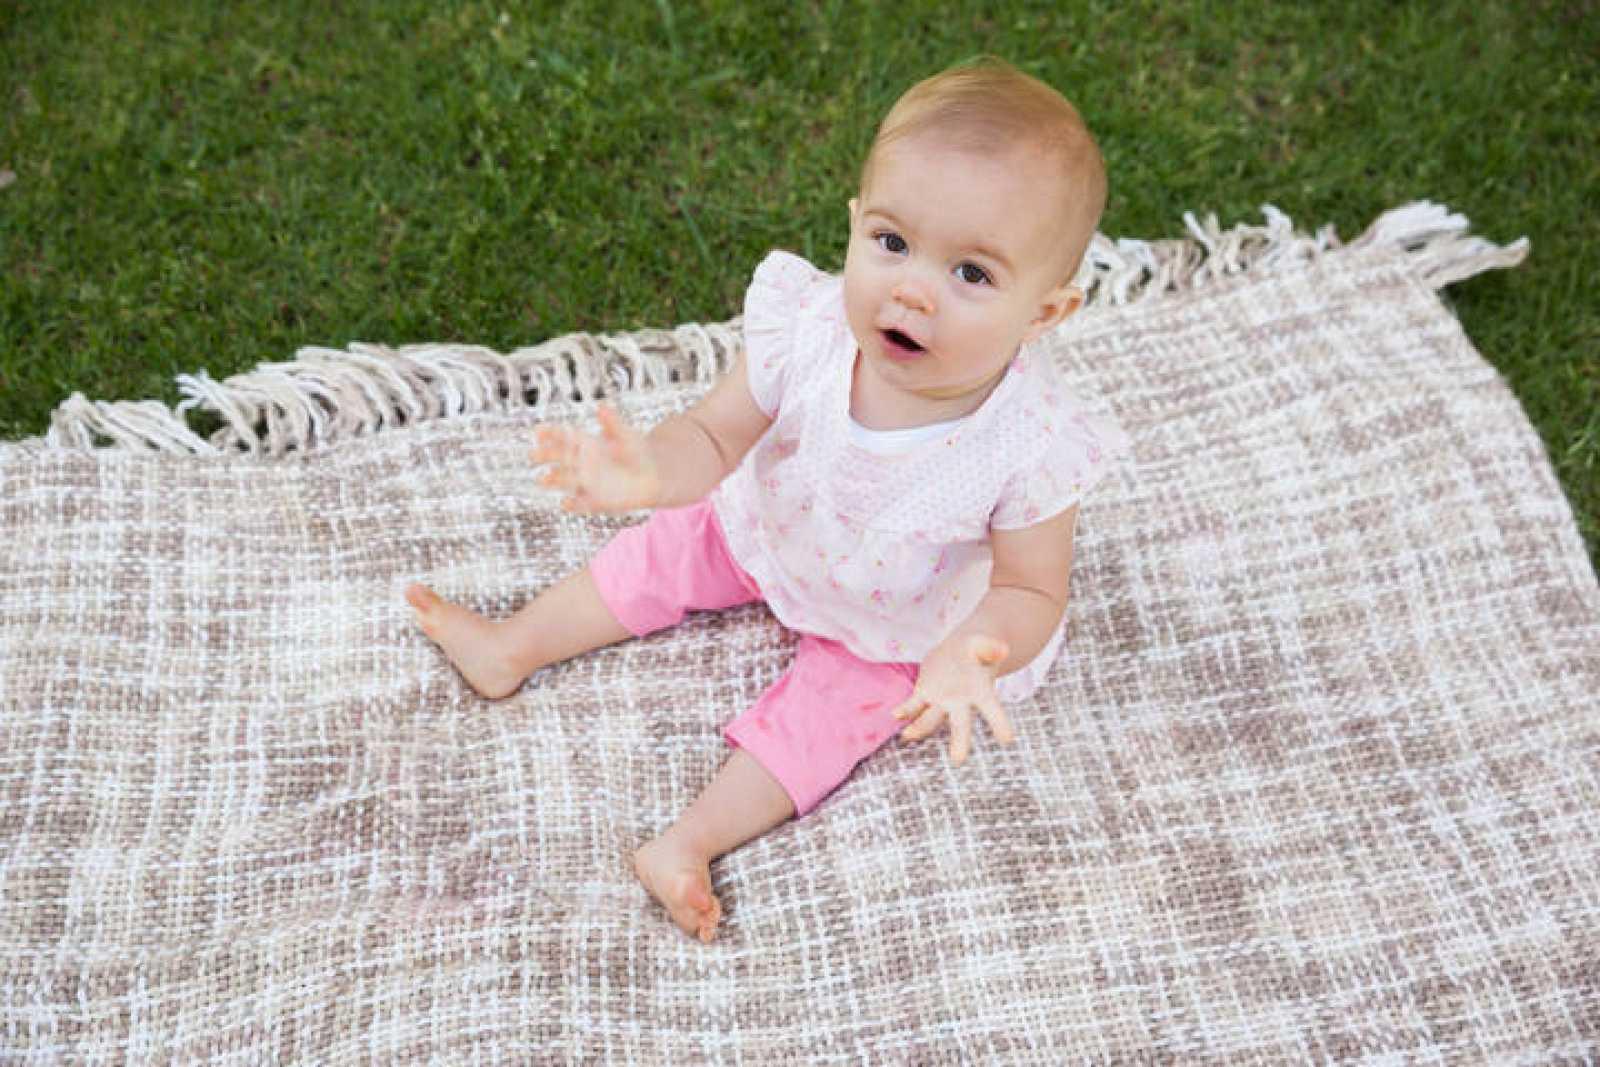 Bebé balbuceando en un parque.